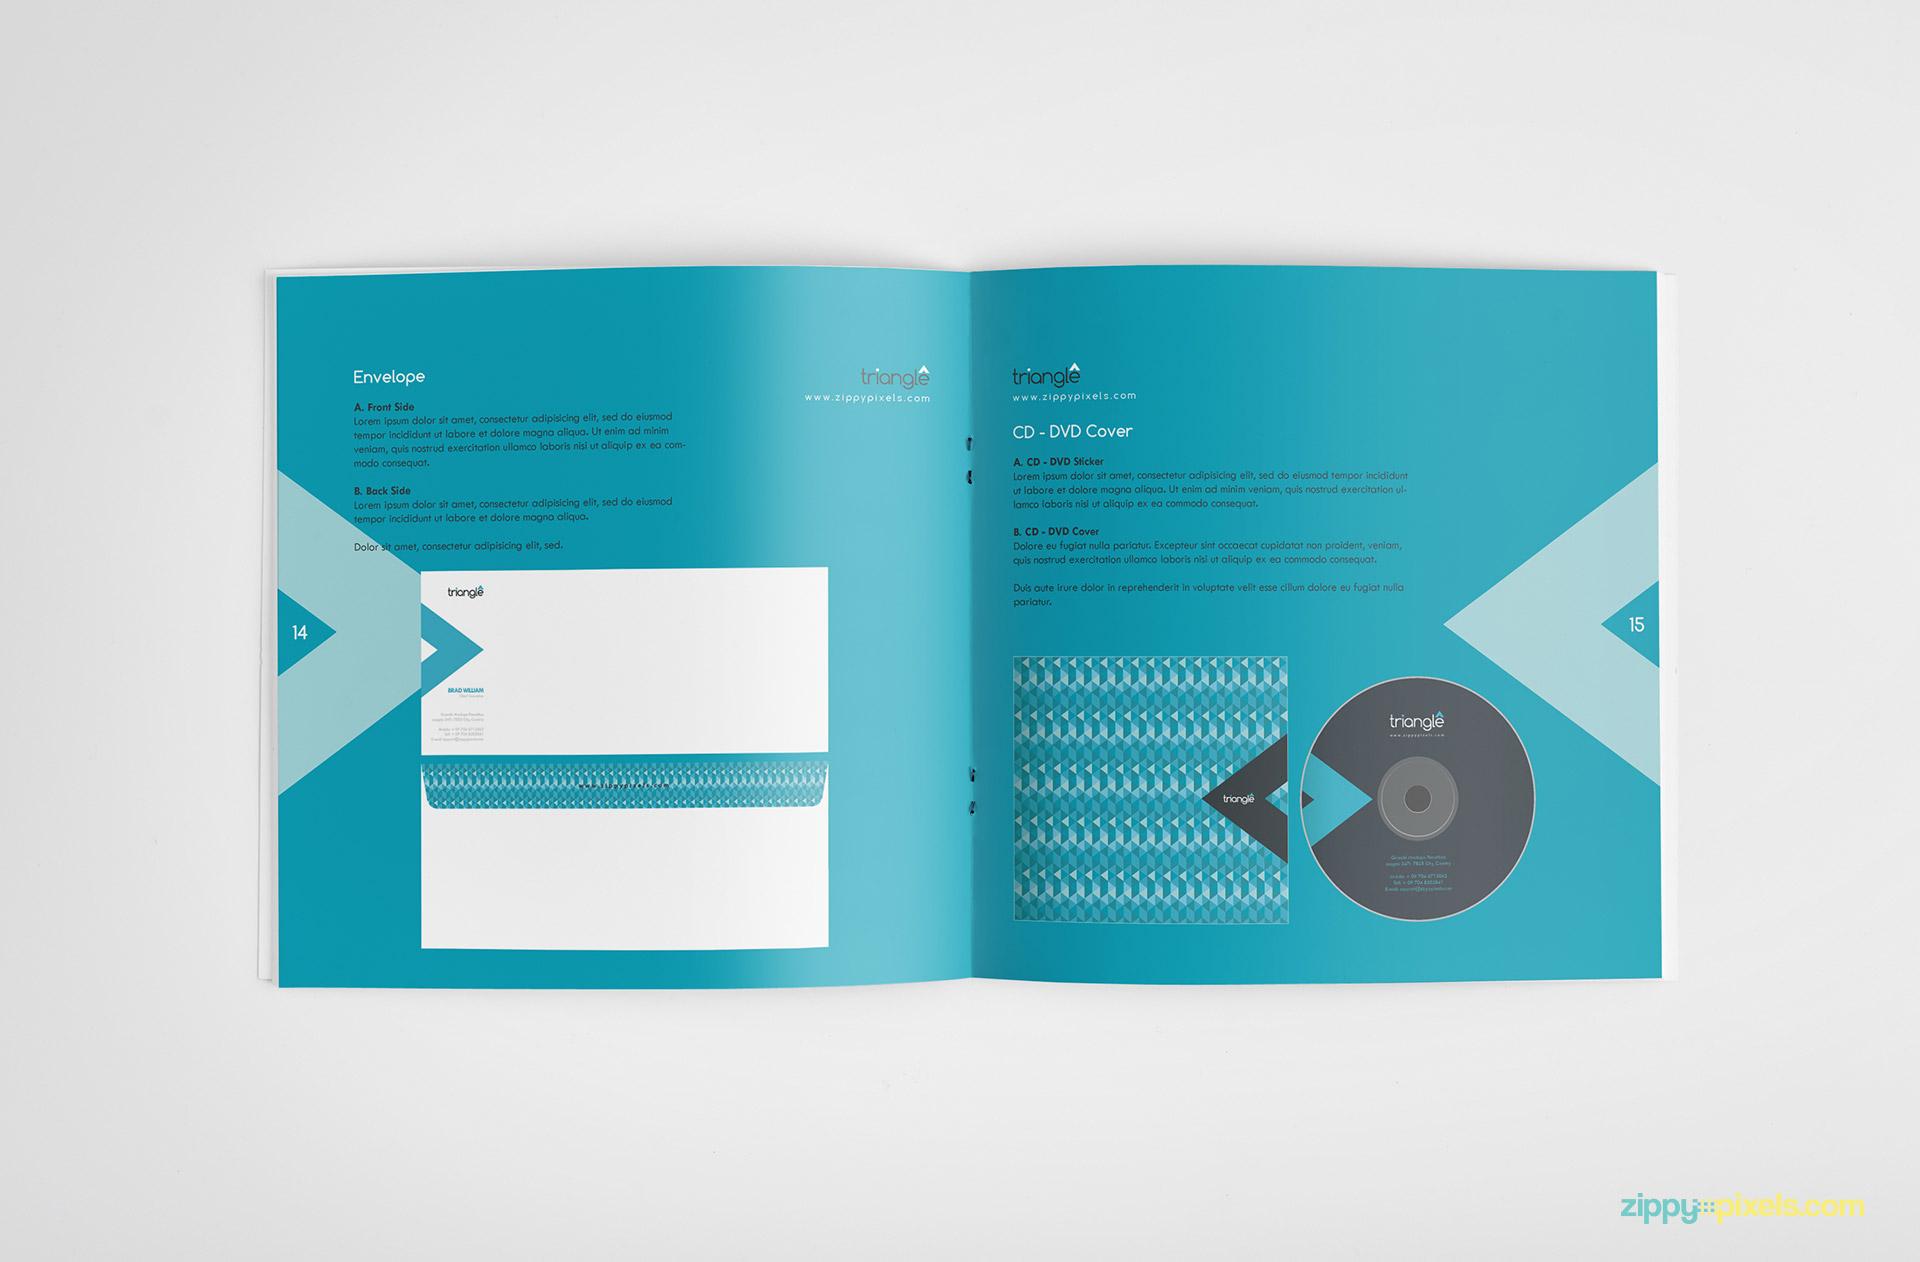 10-brand-book-11-envelope-cd-dvd-cover